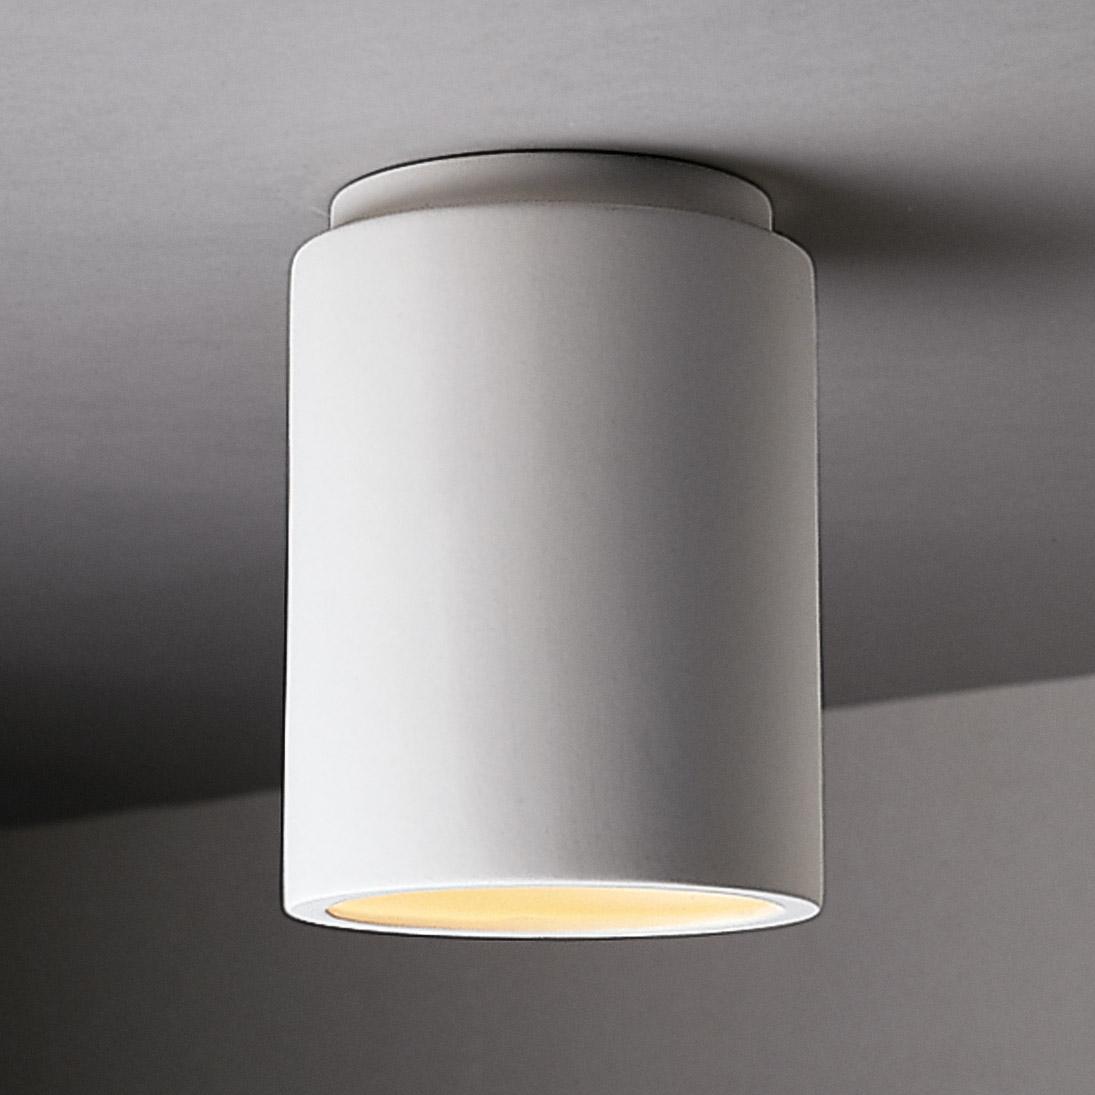 home ceiling lighting close to ceiling light fixtures flush